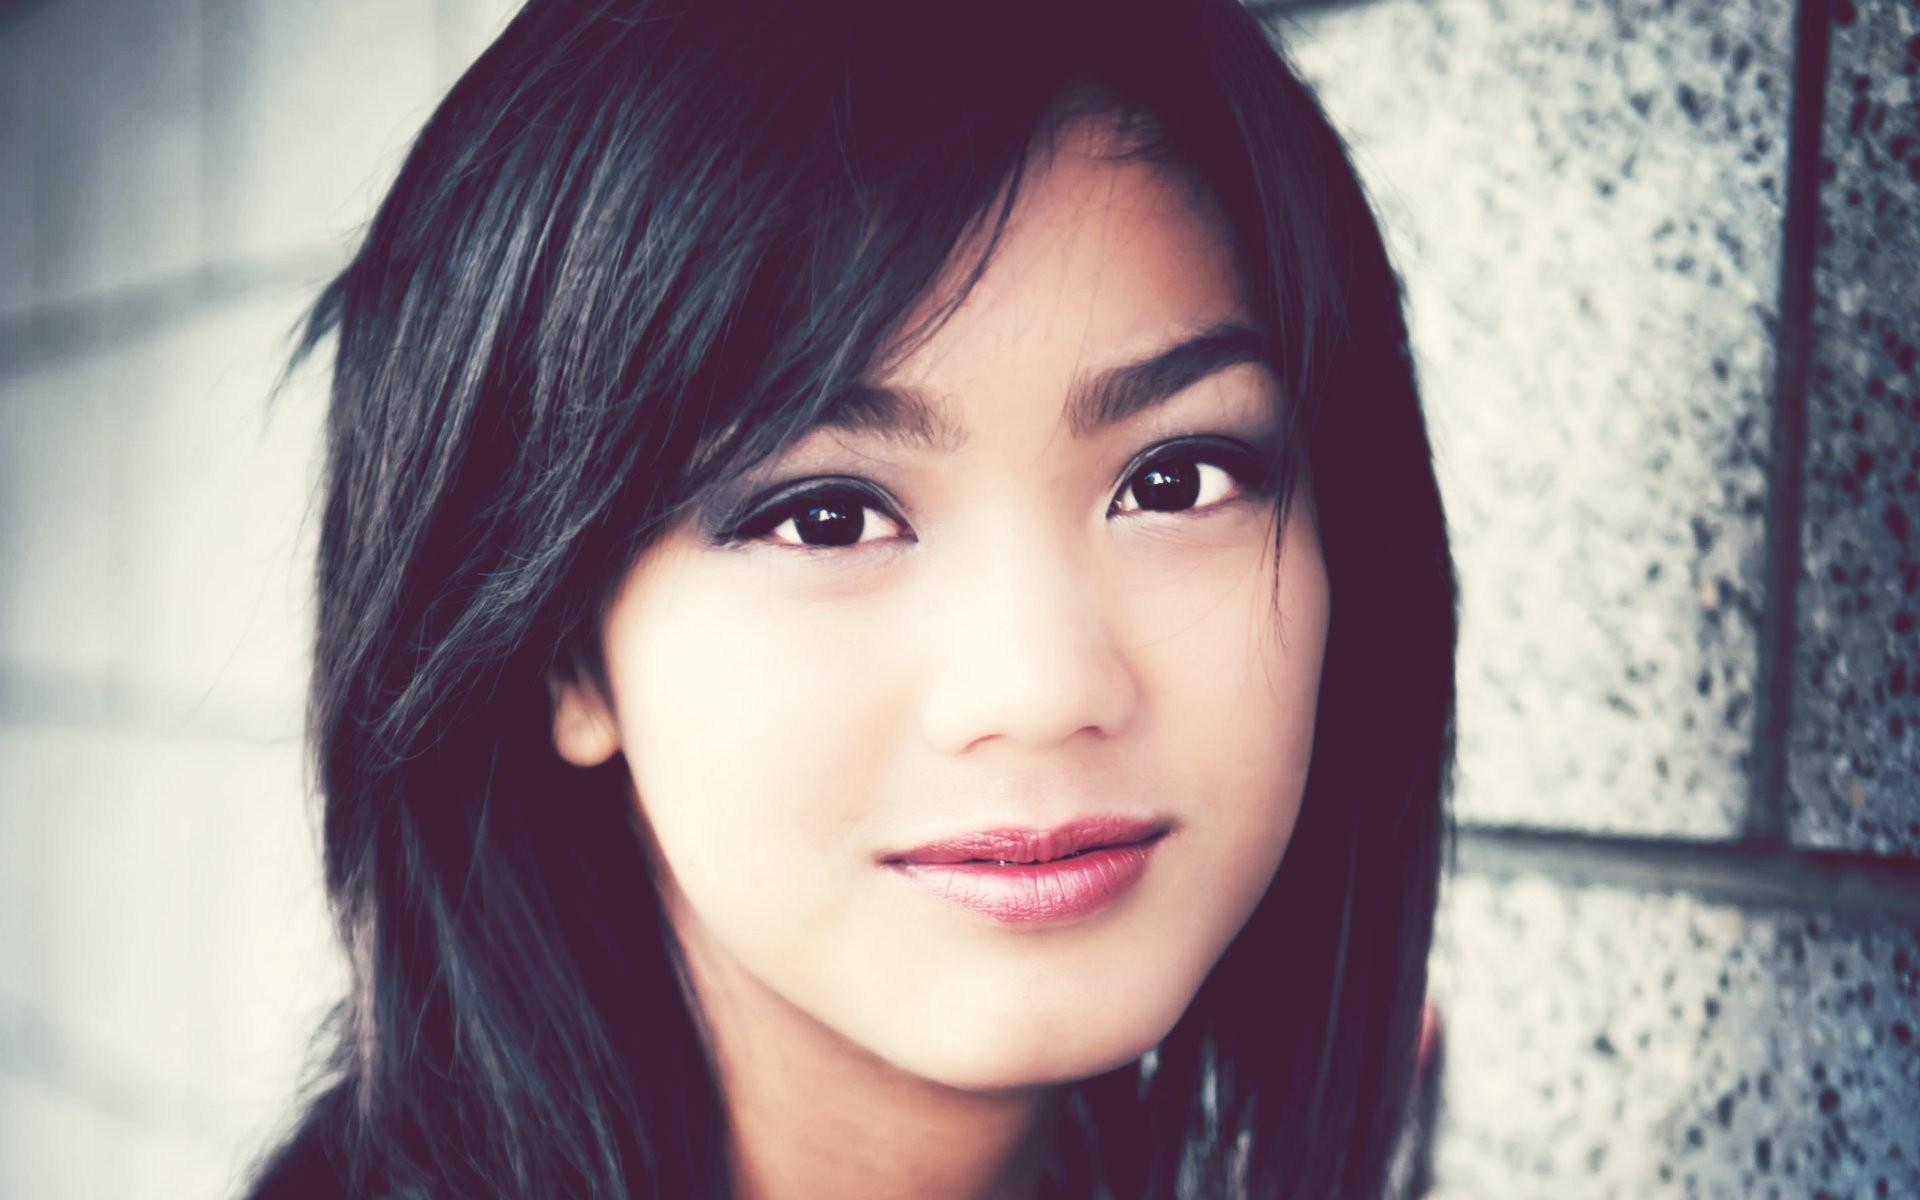 Close-Up Photography Beauty Brunette Girl